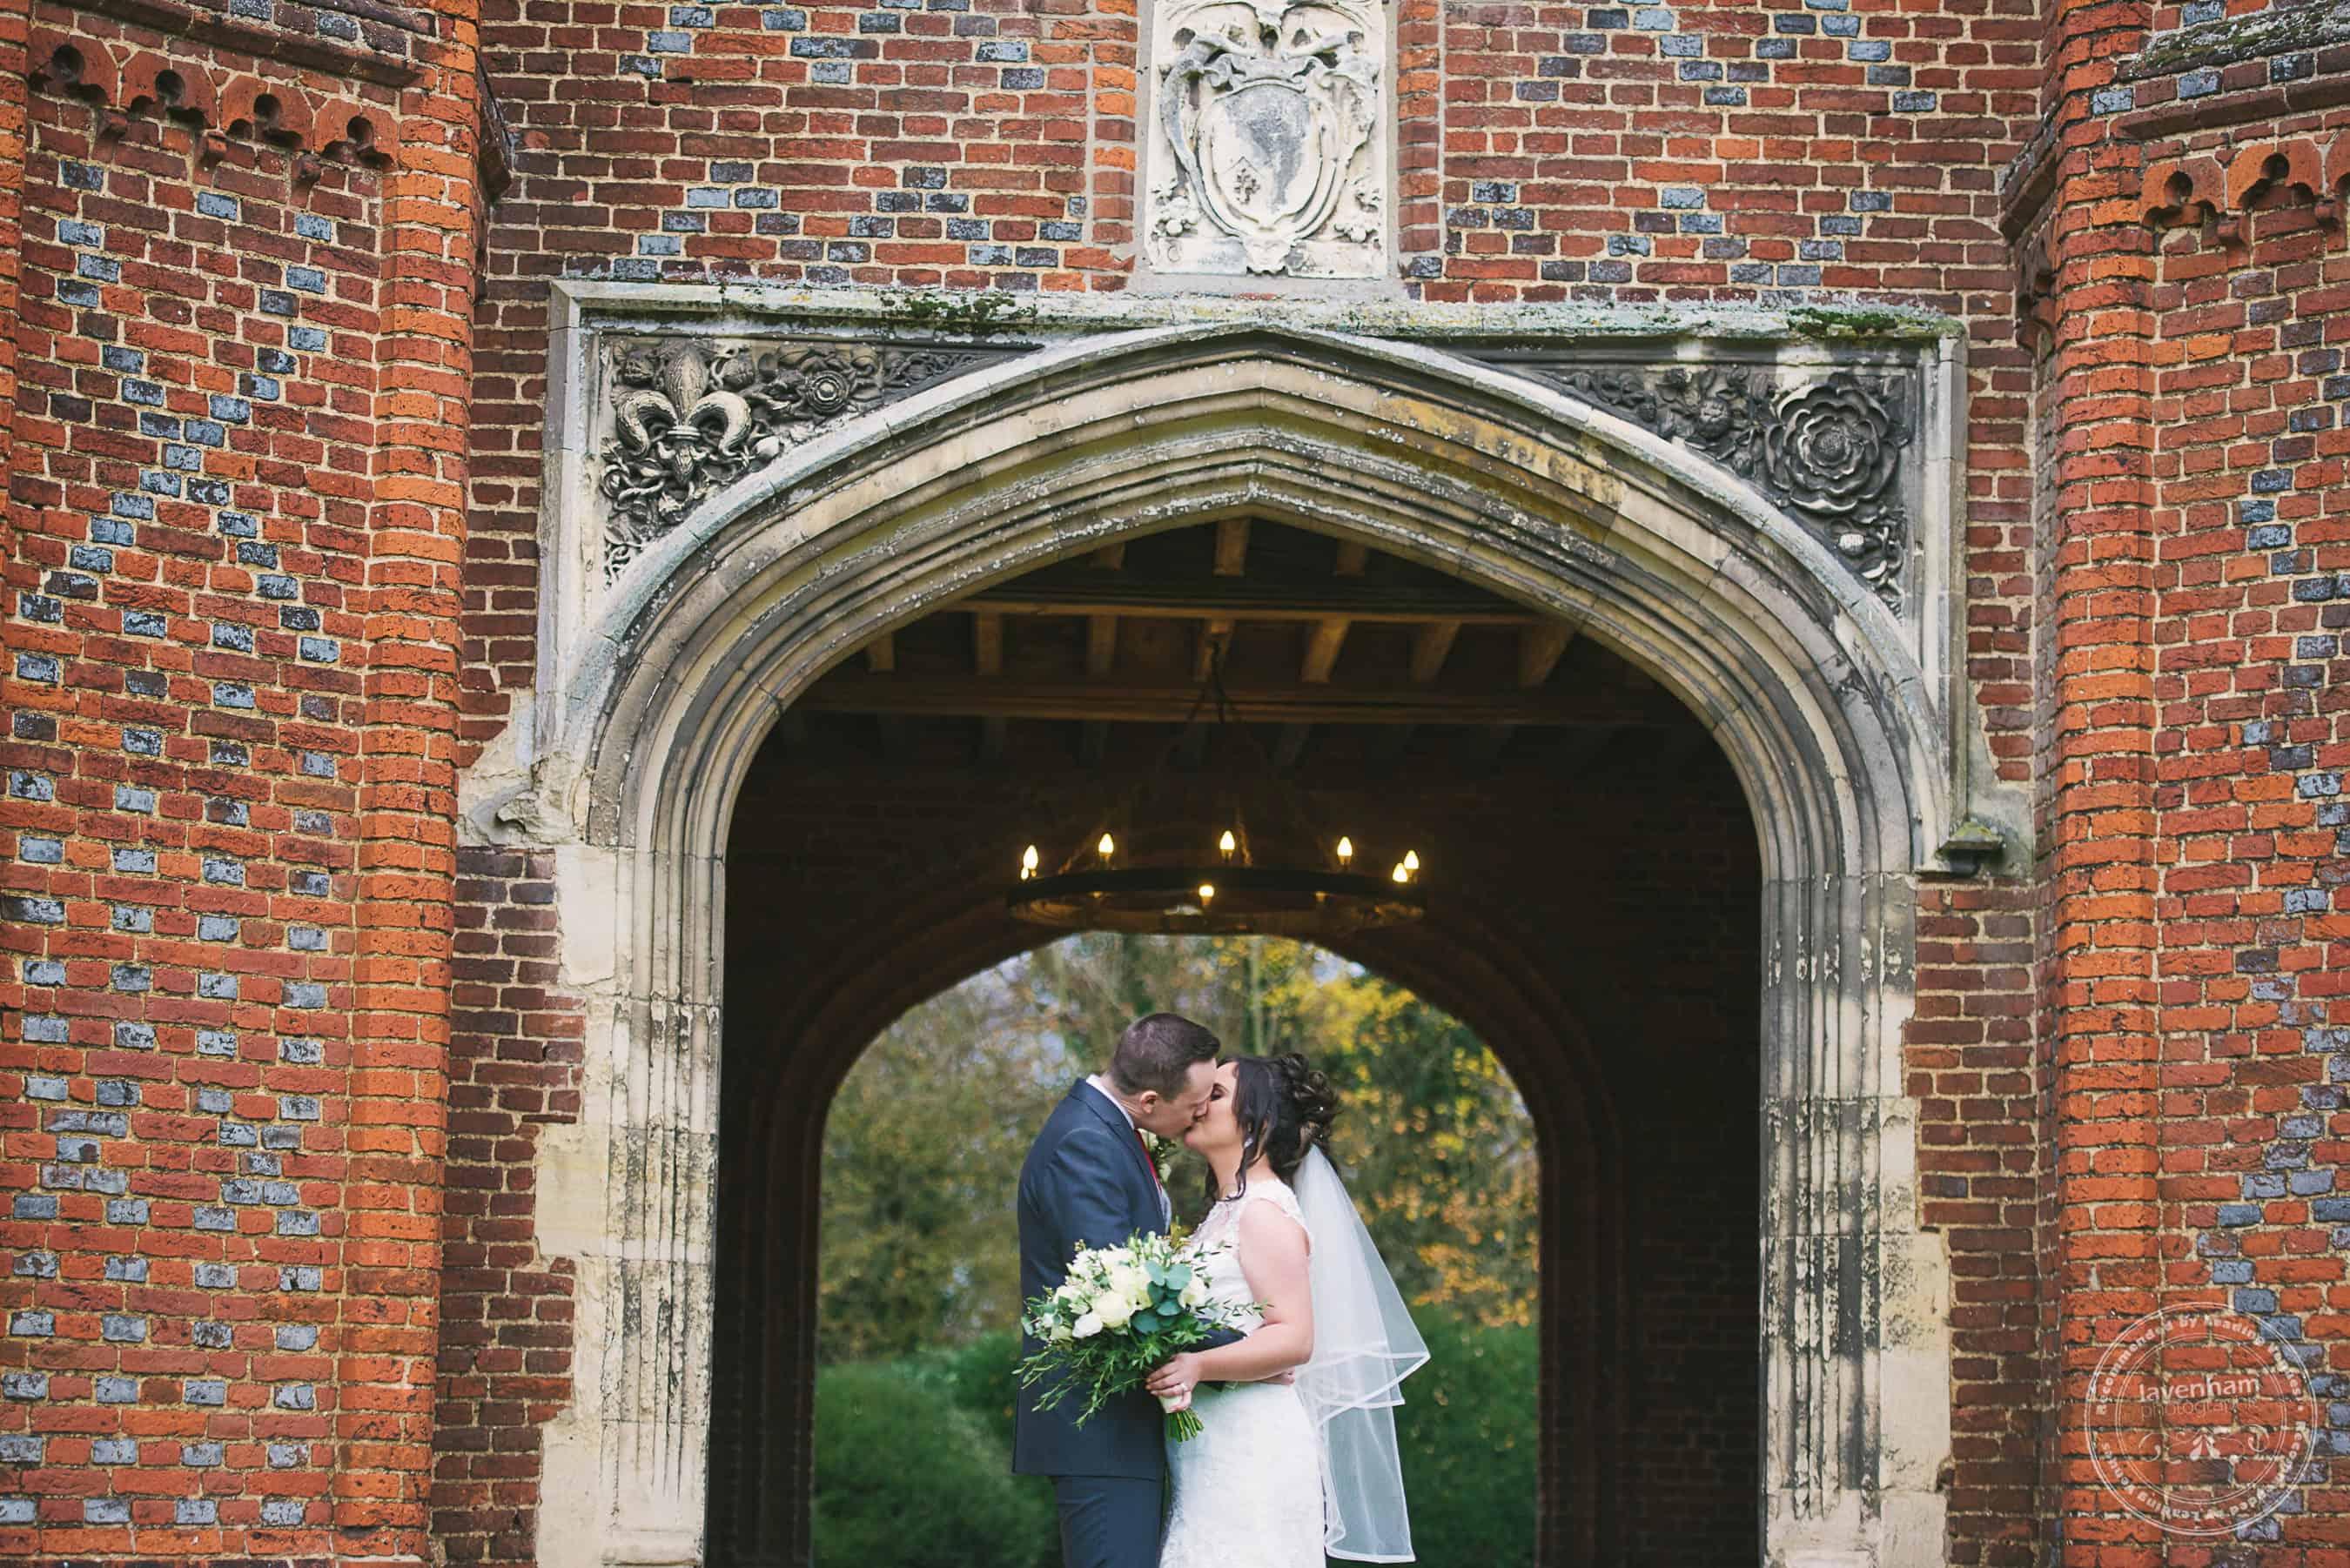 251118 Leez Priory Wedding Photography by Lavenham Photographic 092